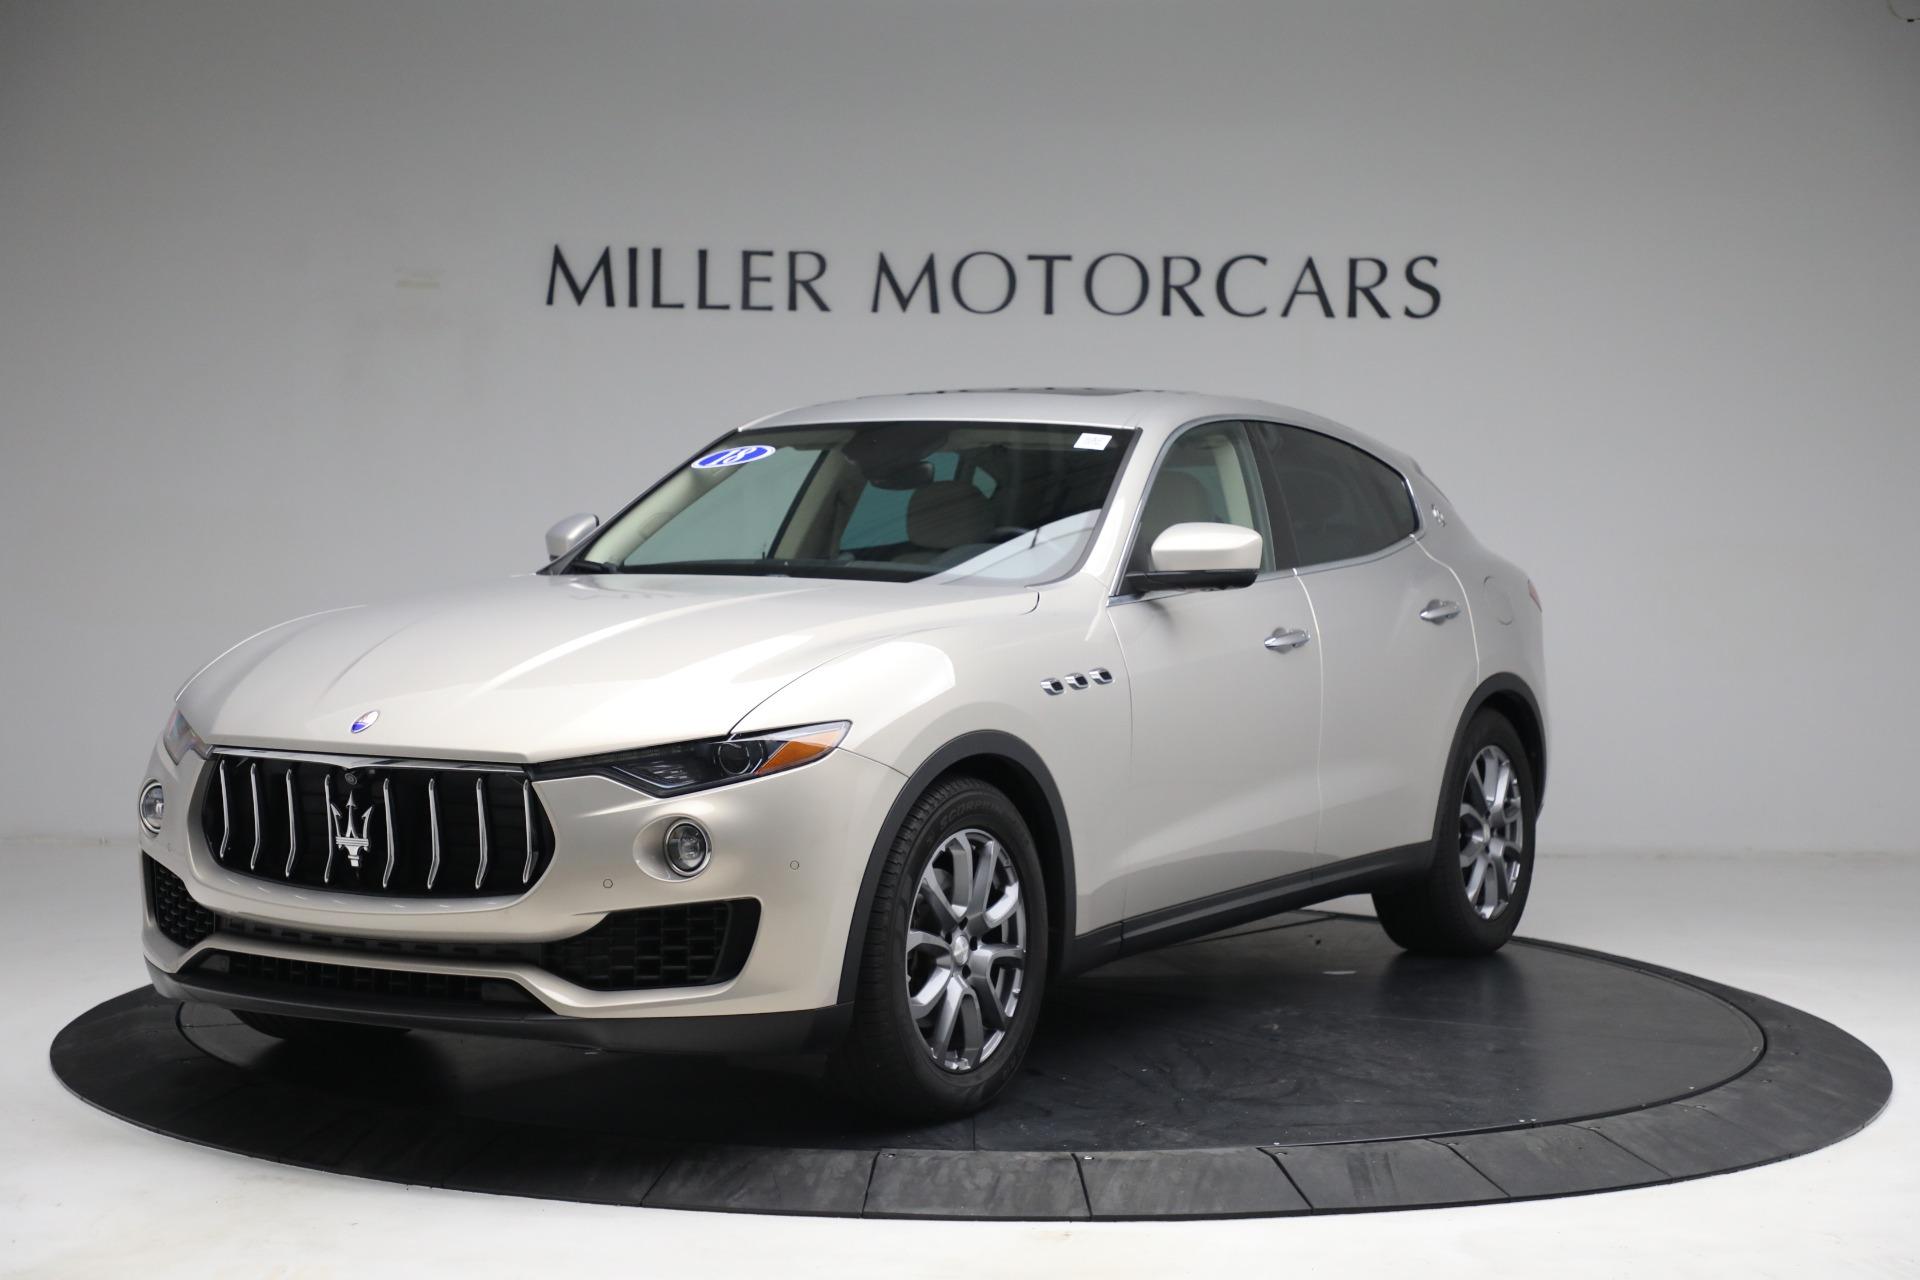 Used 2018 Maserati Levante for sale $57,900 at McLaren Greenwich in Greenwich CT 06830 1